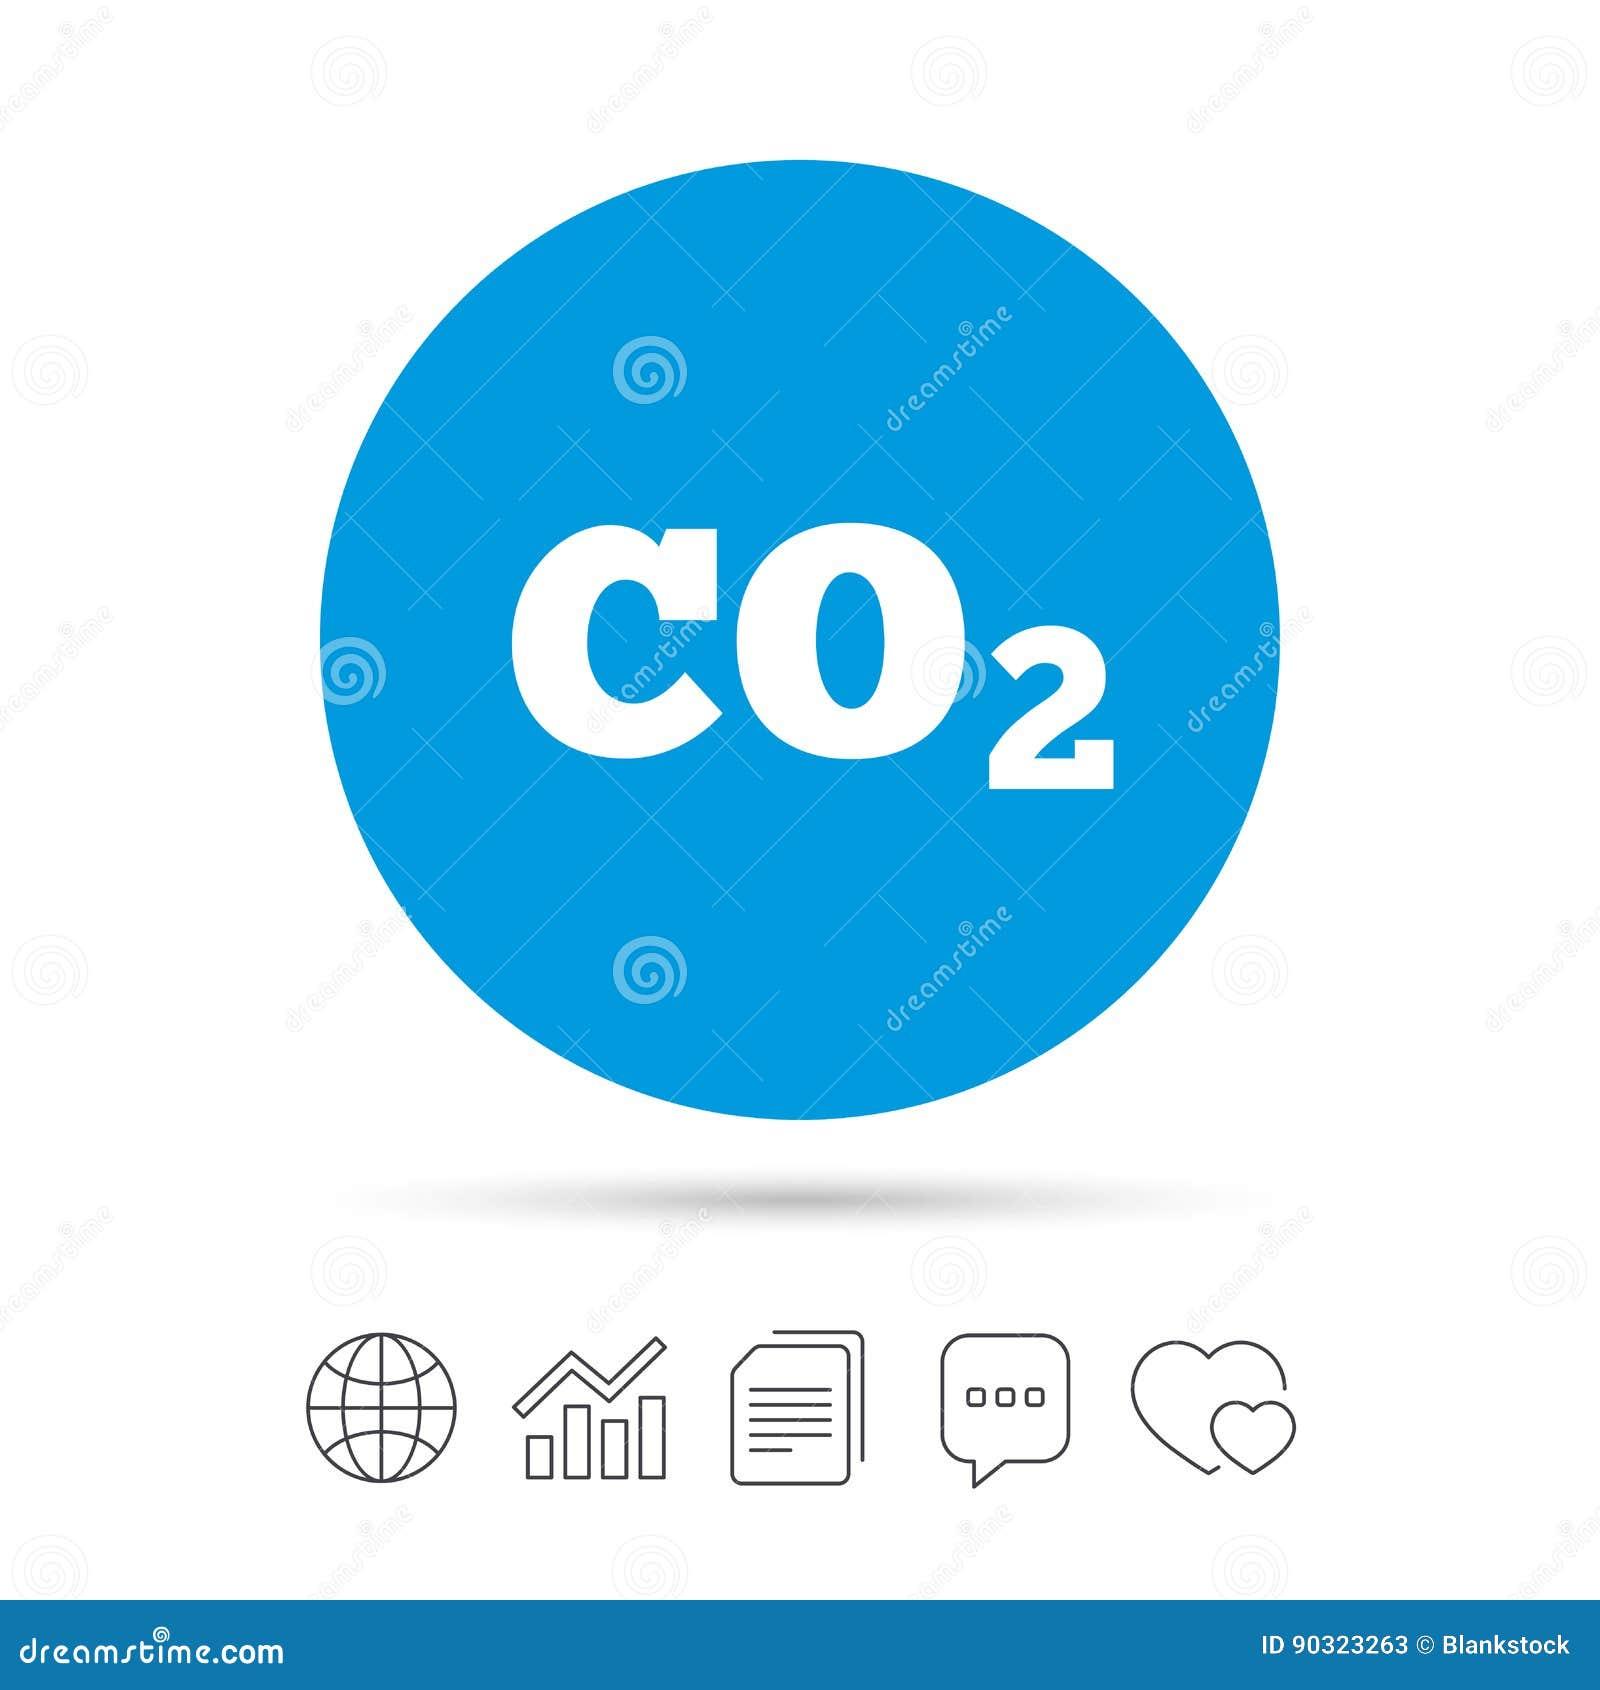 Co2 carbon dioxide formula sign icon chemistry stock vector co2 carbon dioxide formula sign icon chemistry buycottarizona Images